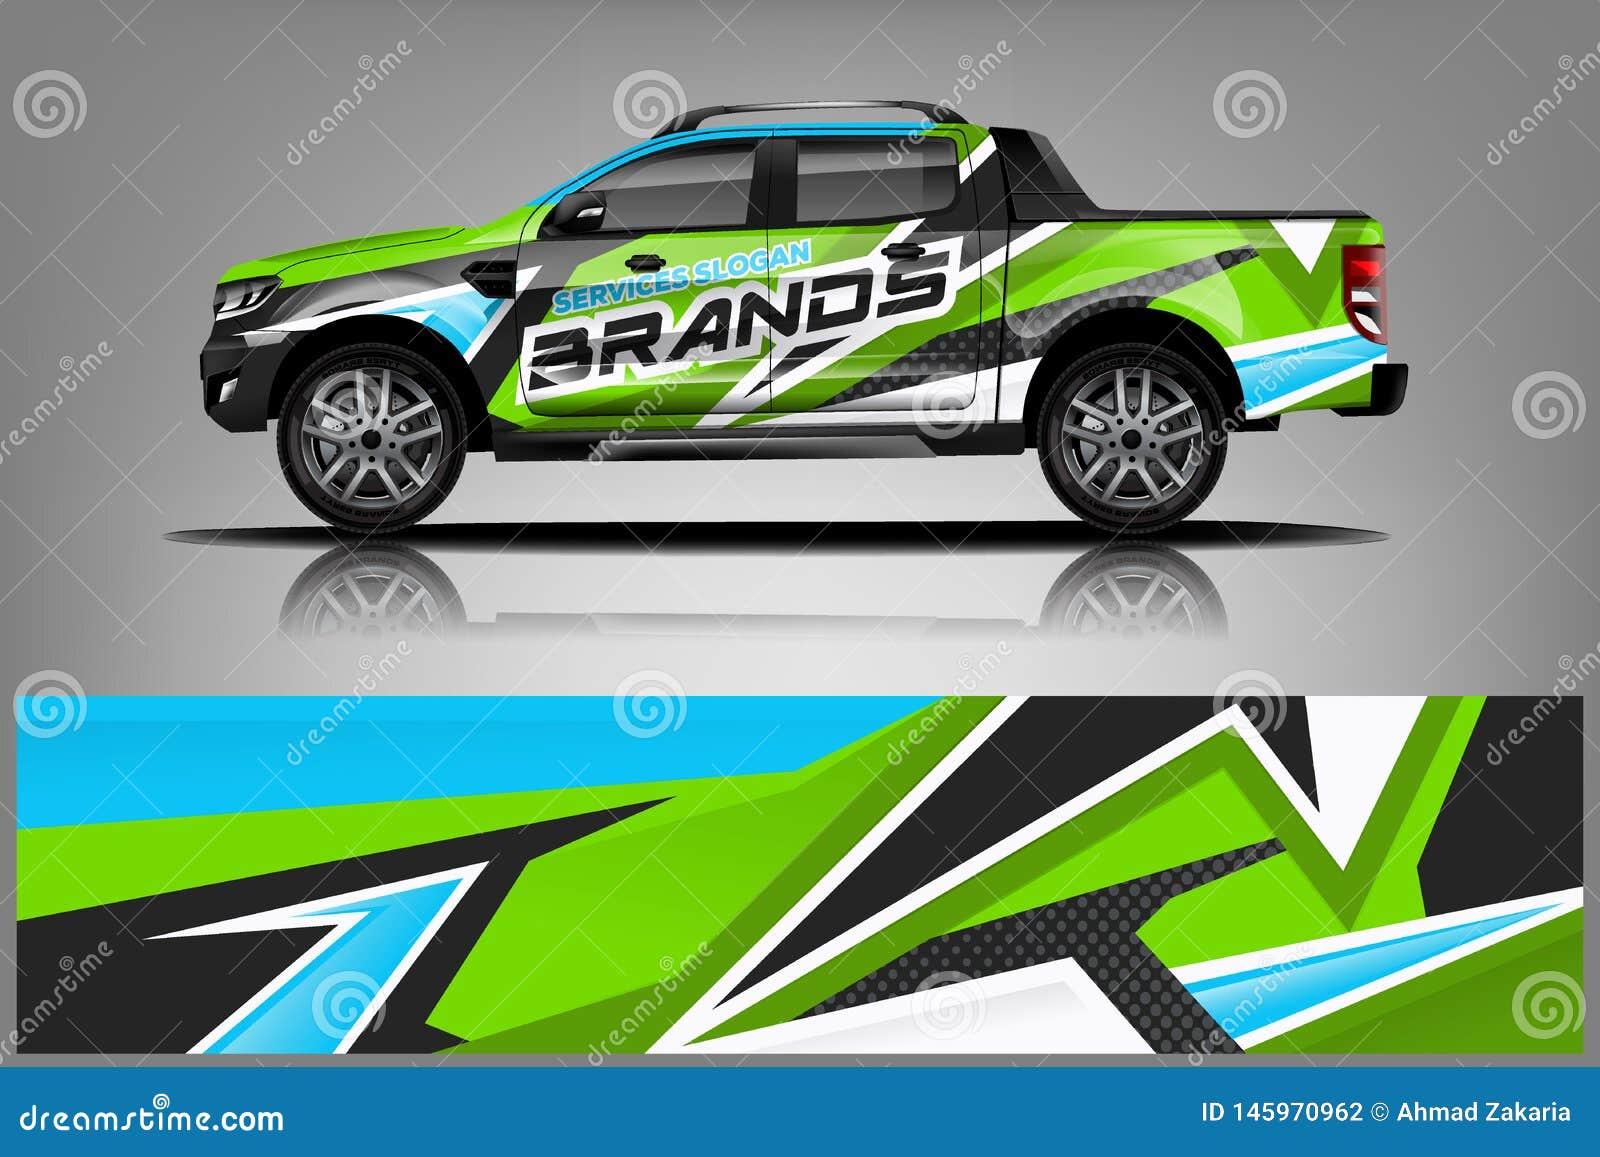 Truck Wrap Livery Design. Ready Print Wrap Design For Van ...